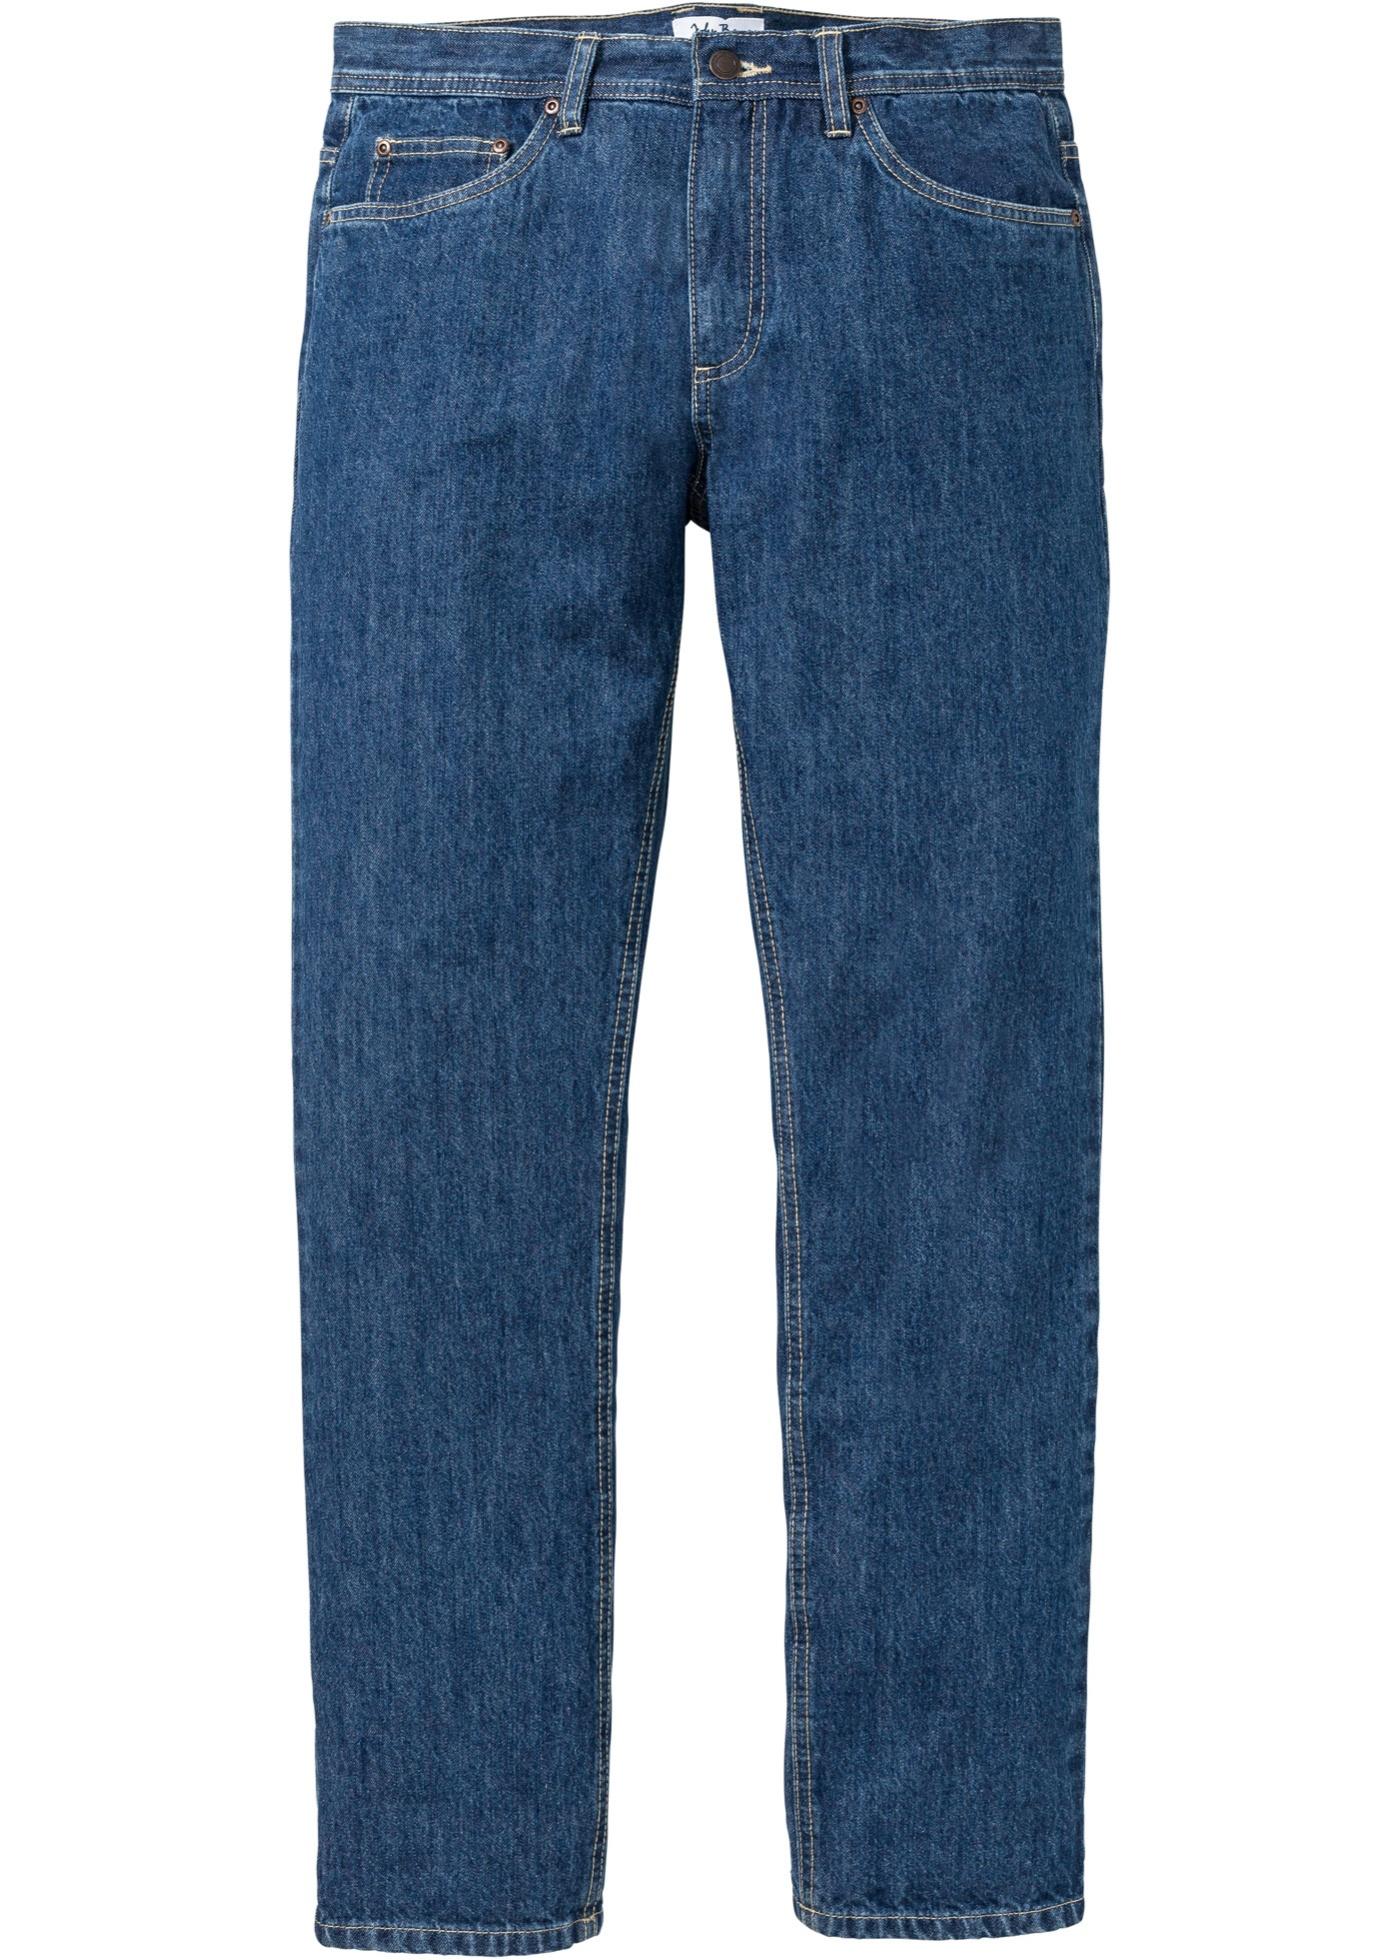 Bonprix - Jeans, smal passform, raka ben 199.00